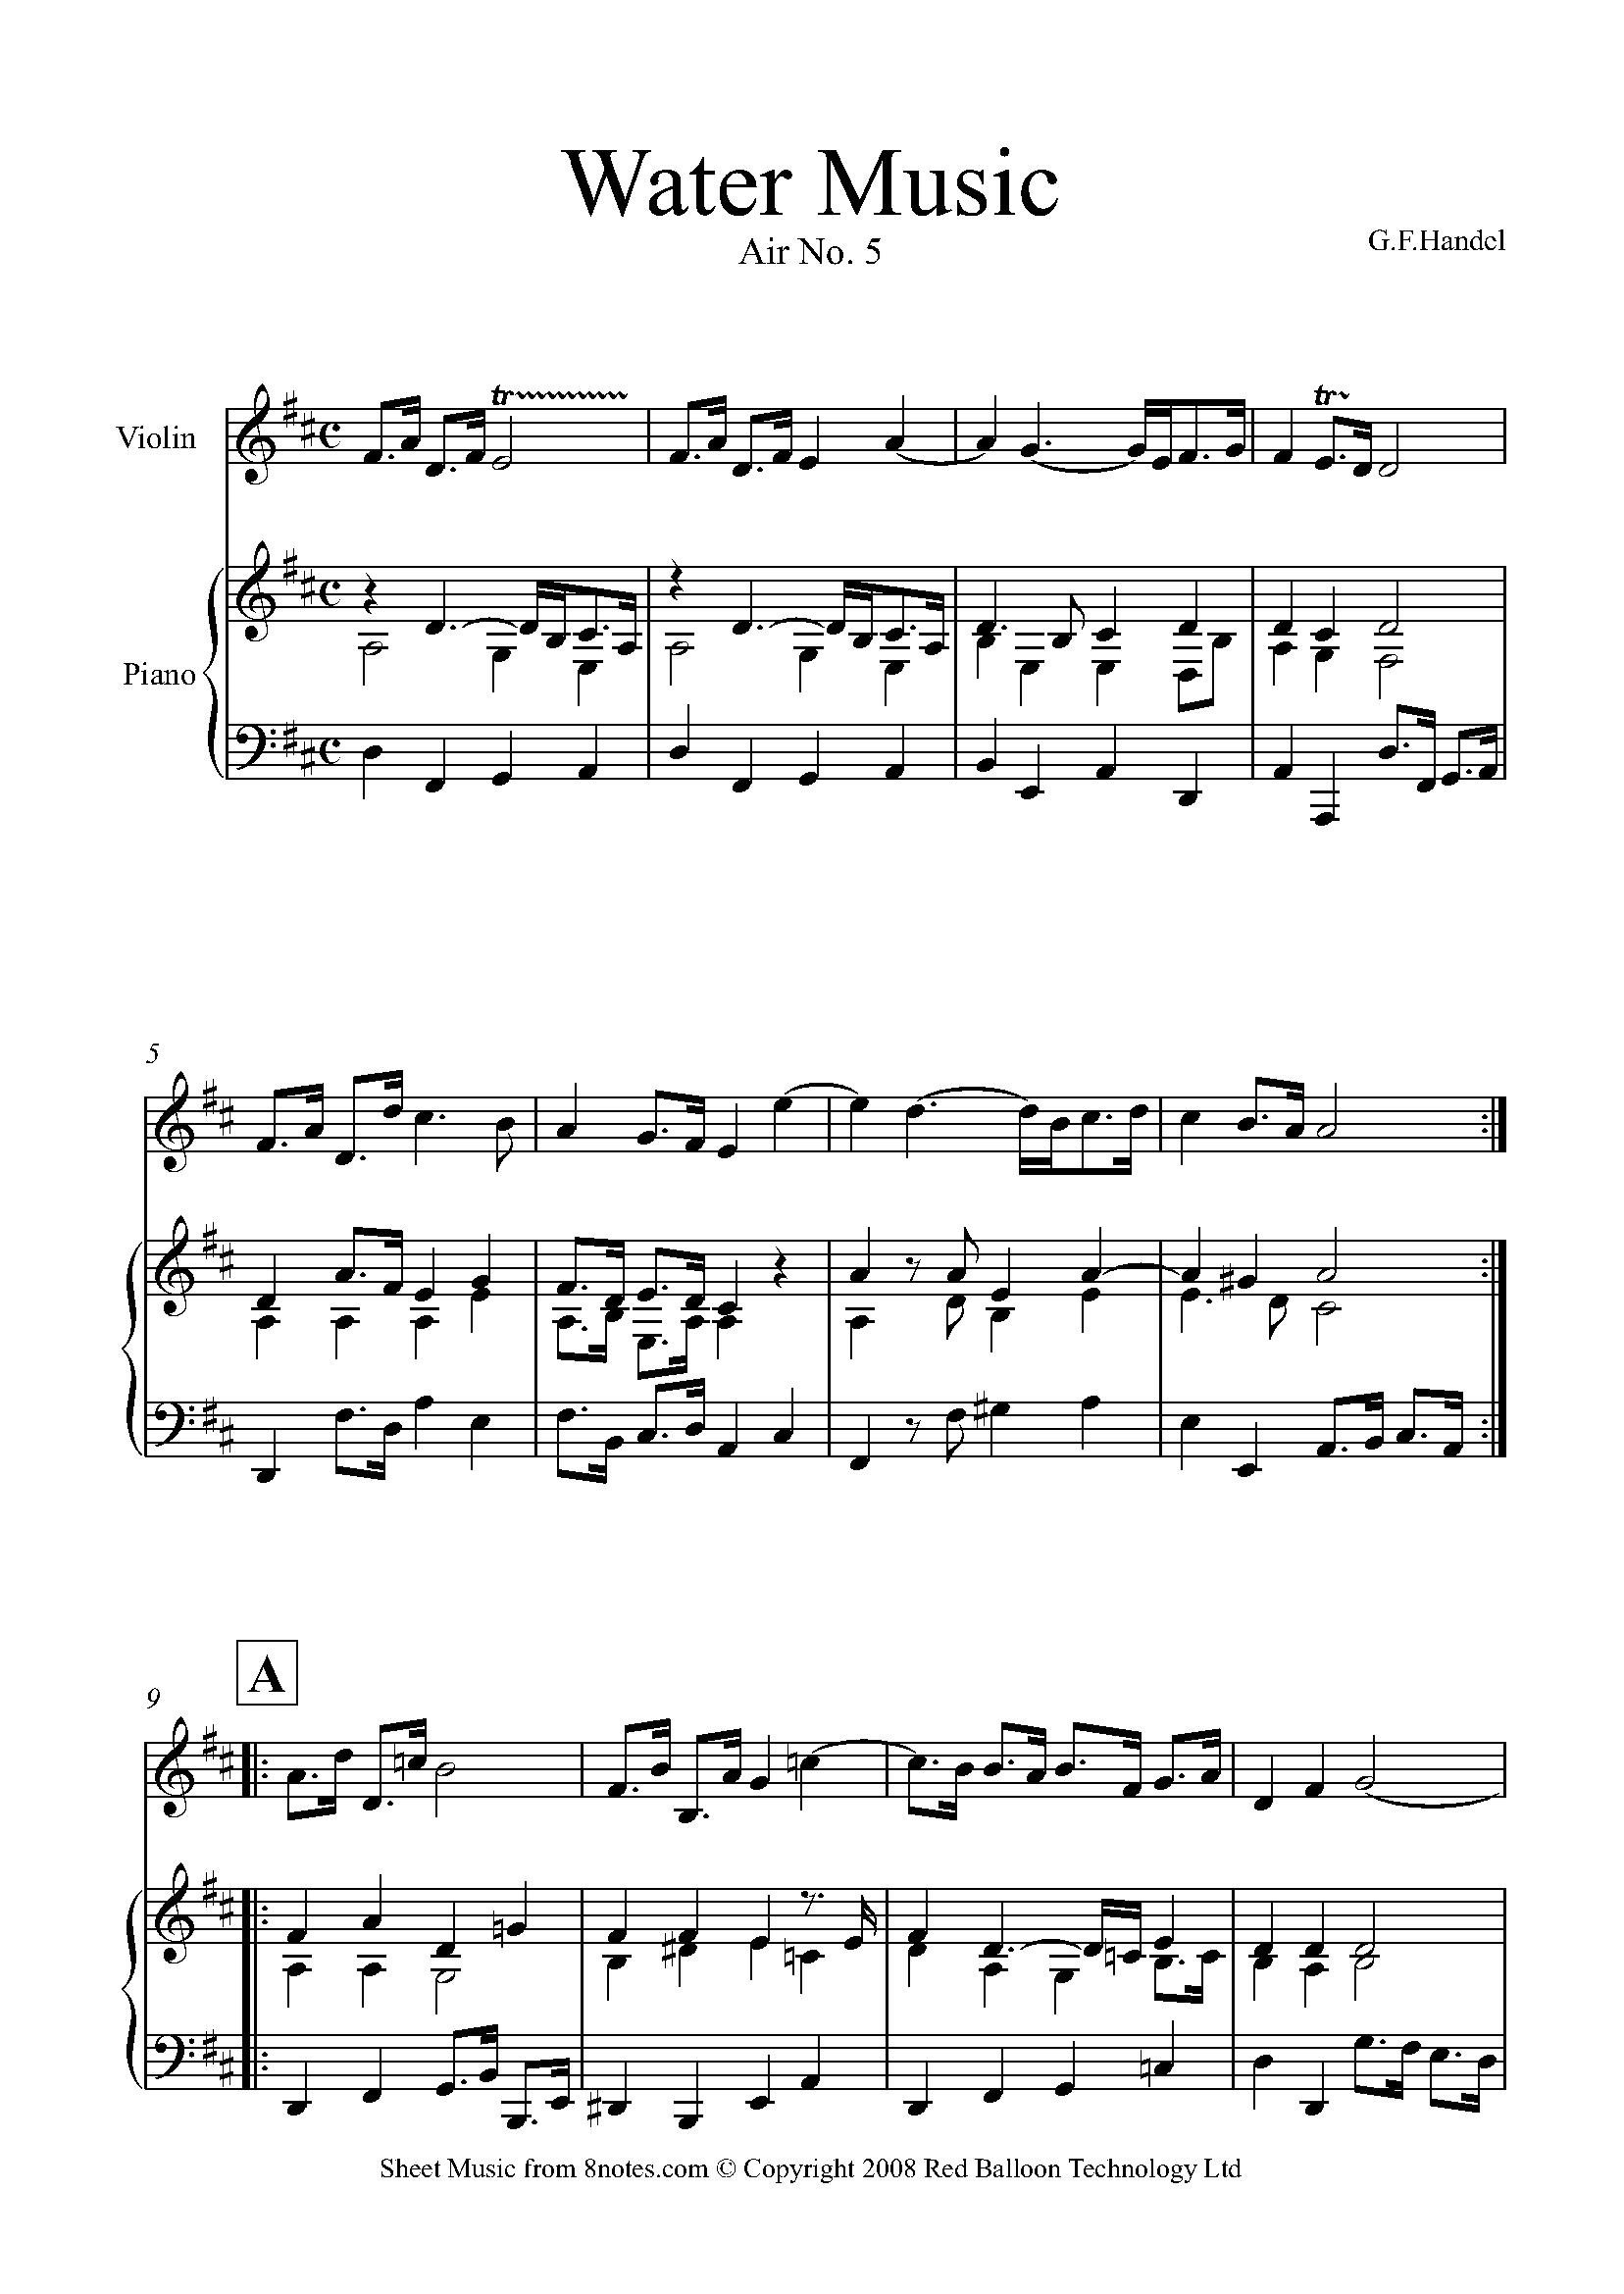 Handel - Water Music (Air No.5) sheet music for Violin - 8notes.com ...